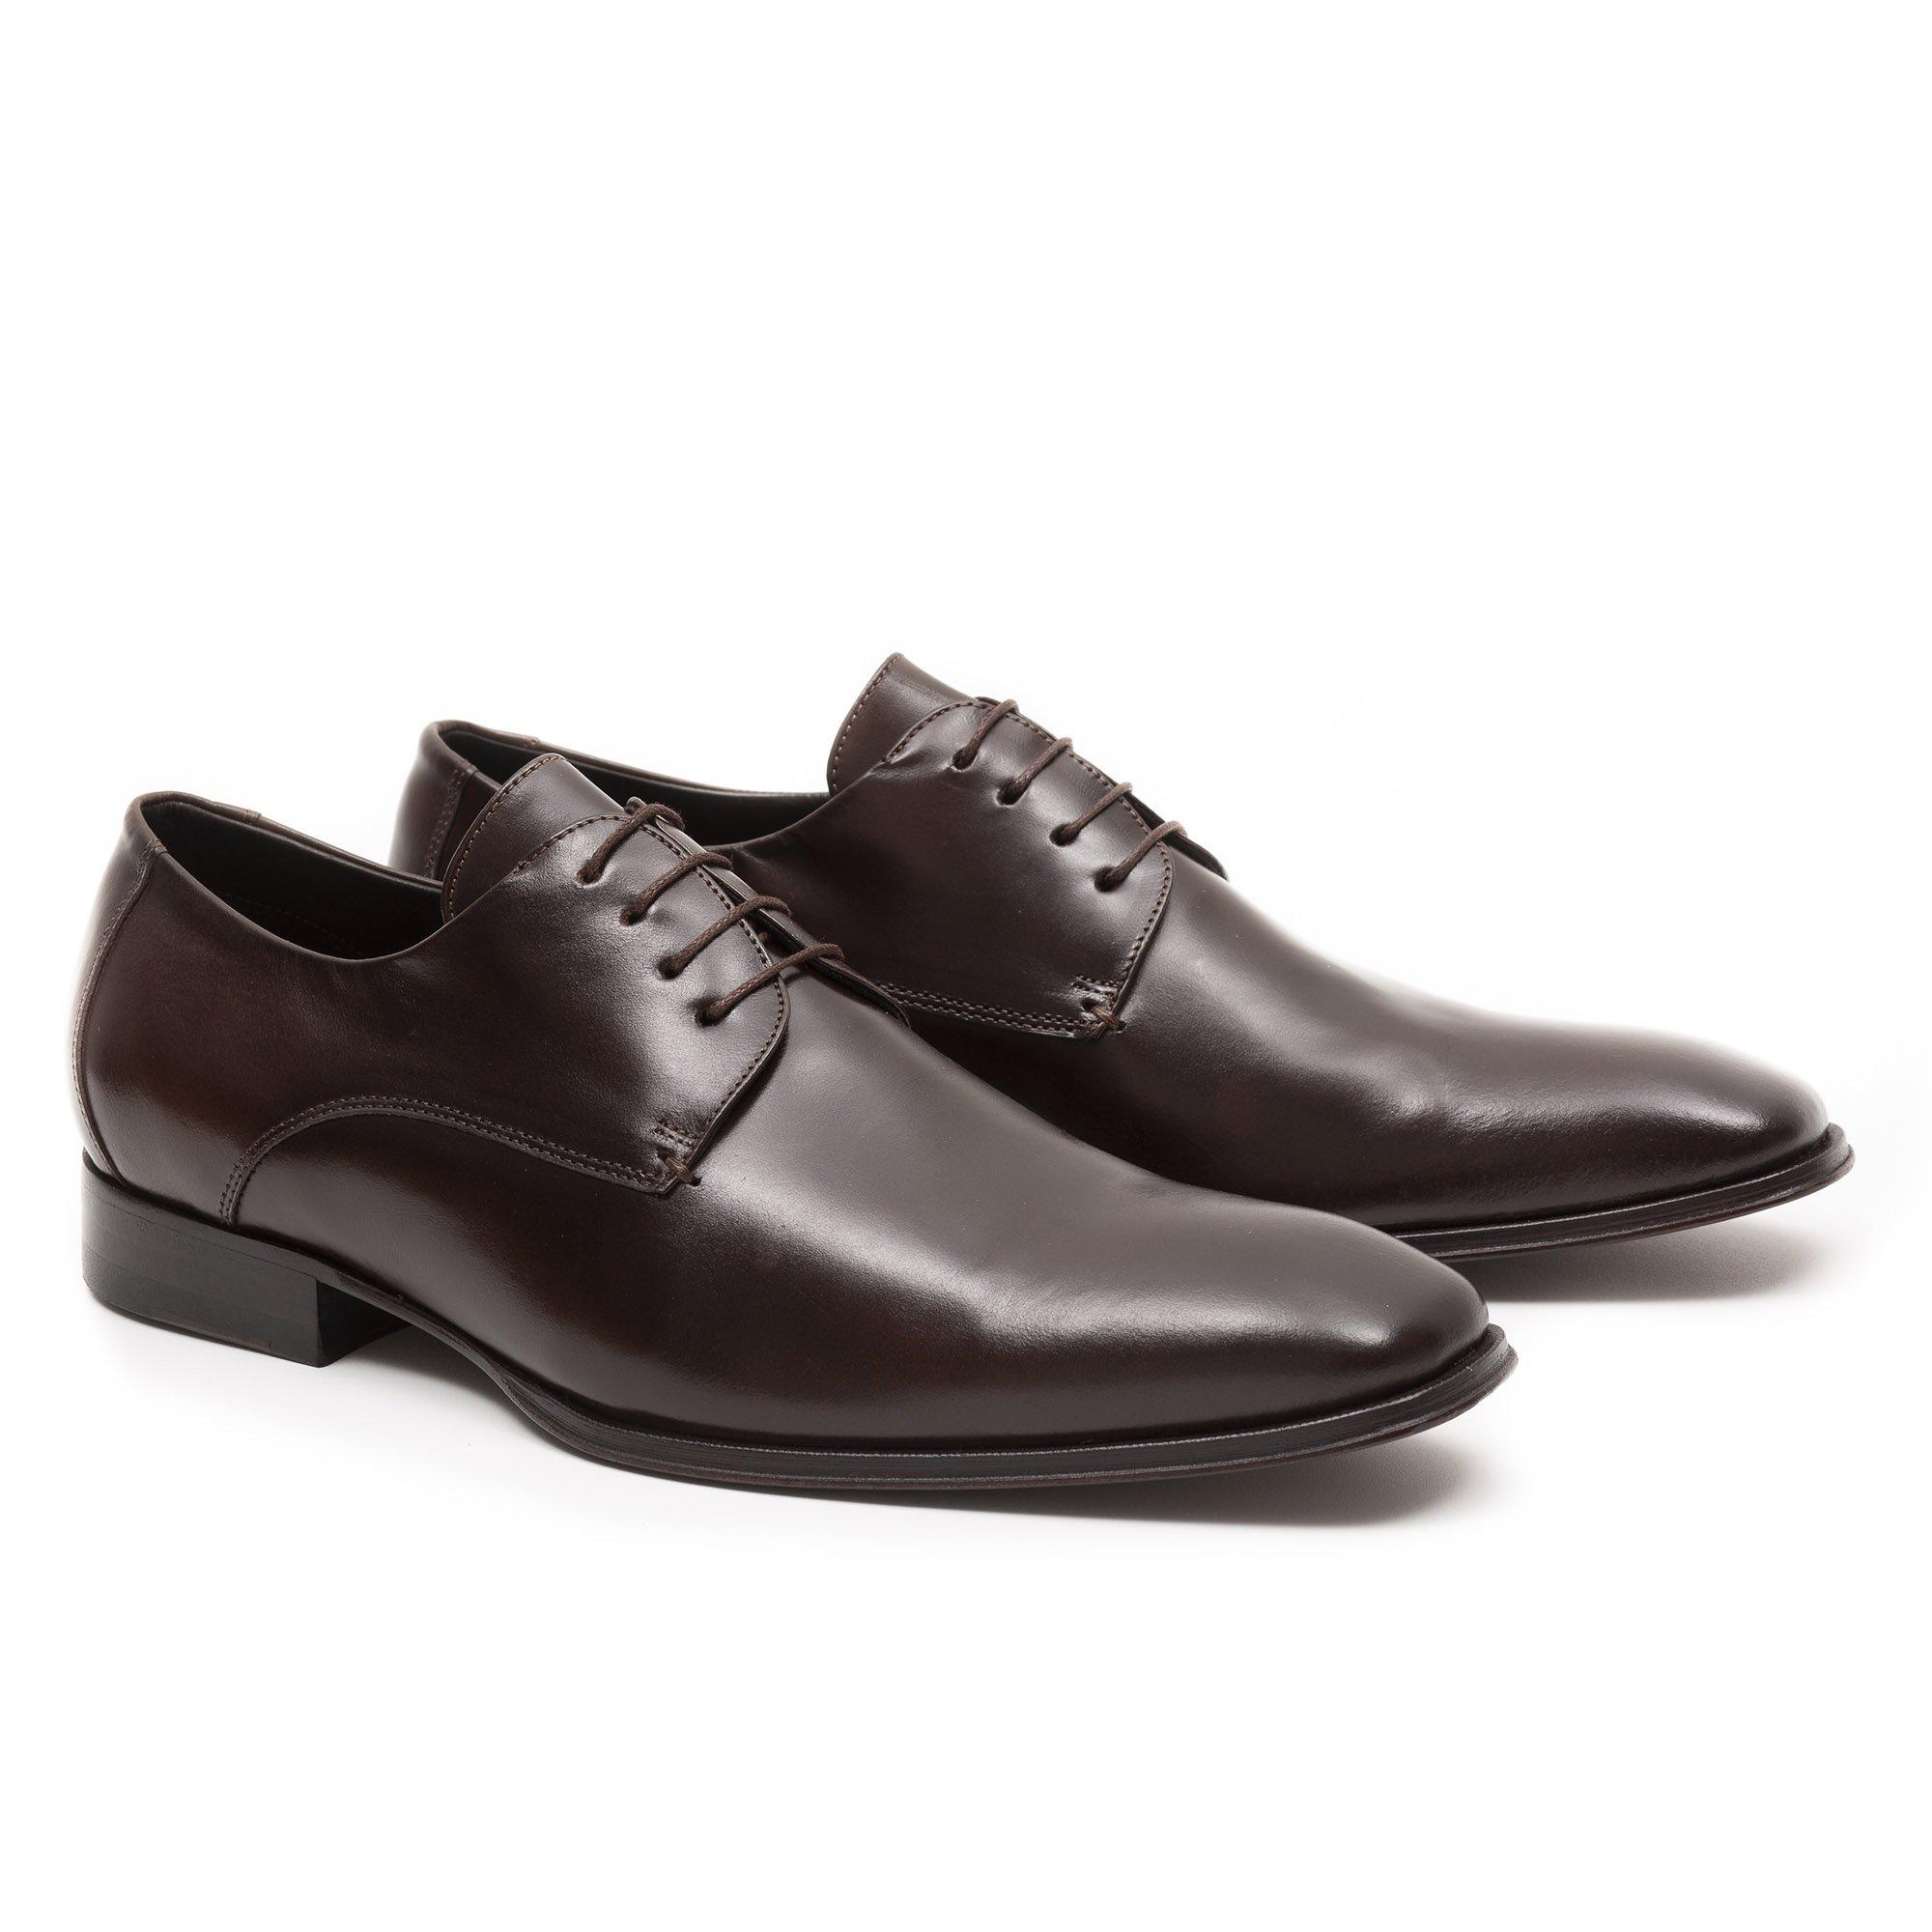 Sapato Social Masculino Derby Marrom Couro Legítimo Monbran Dressy 05756C